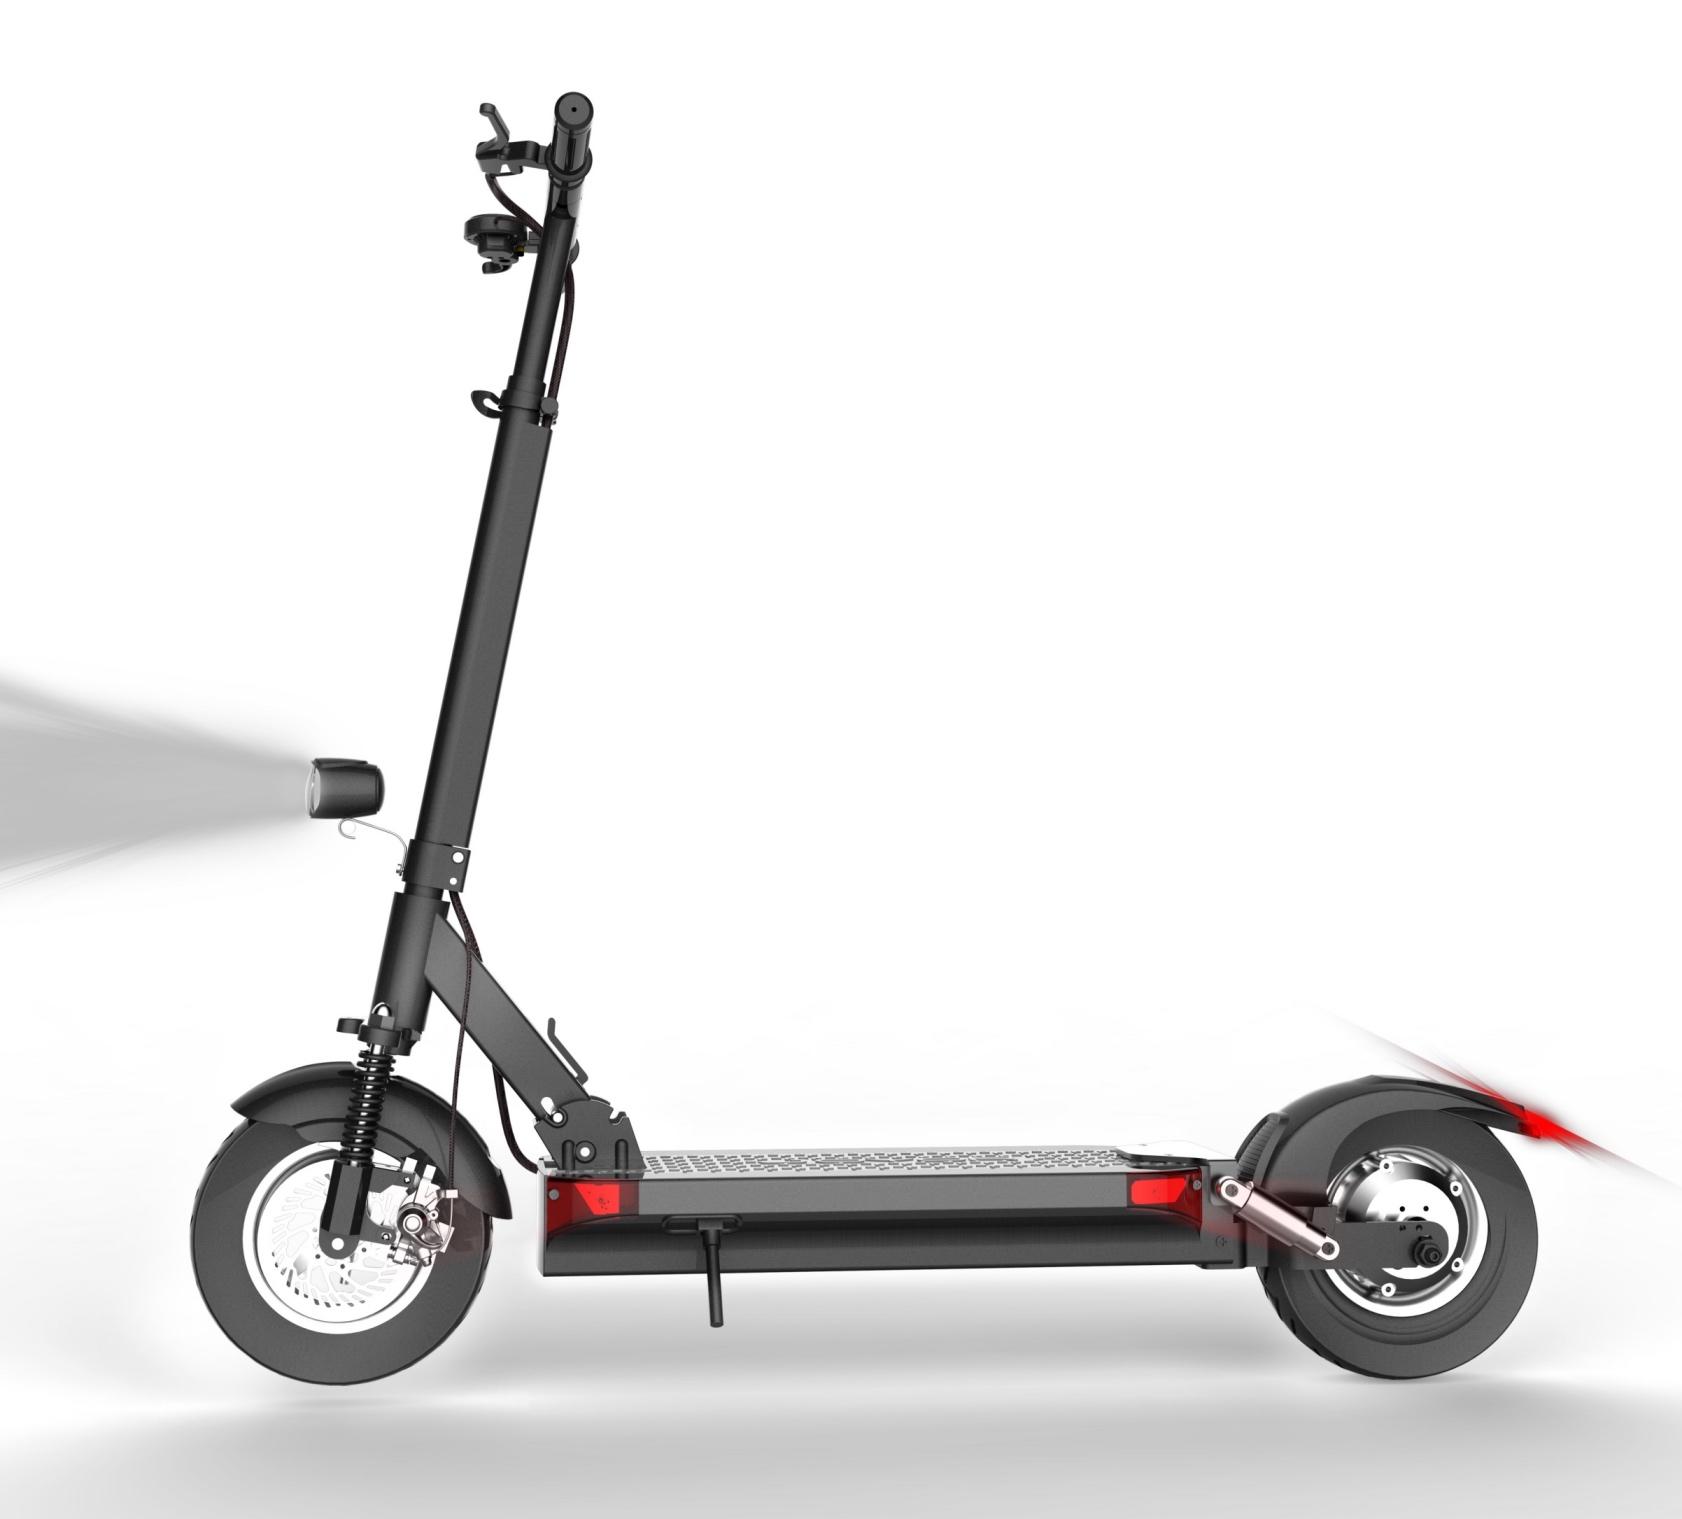 Joyor Y5S/Y10 | Europe | Joyor Electric Scooter